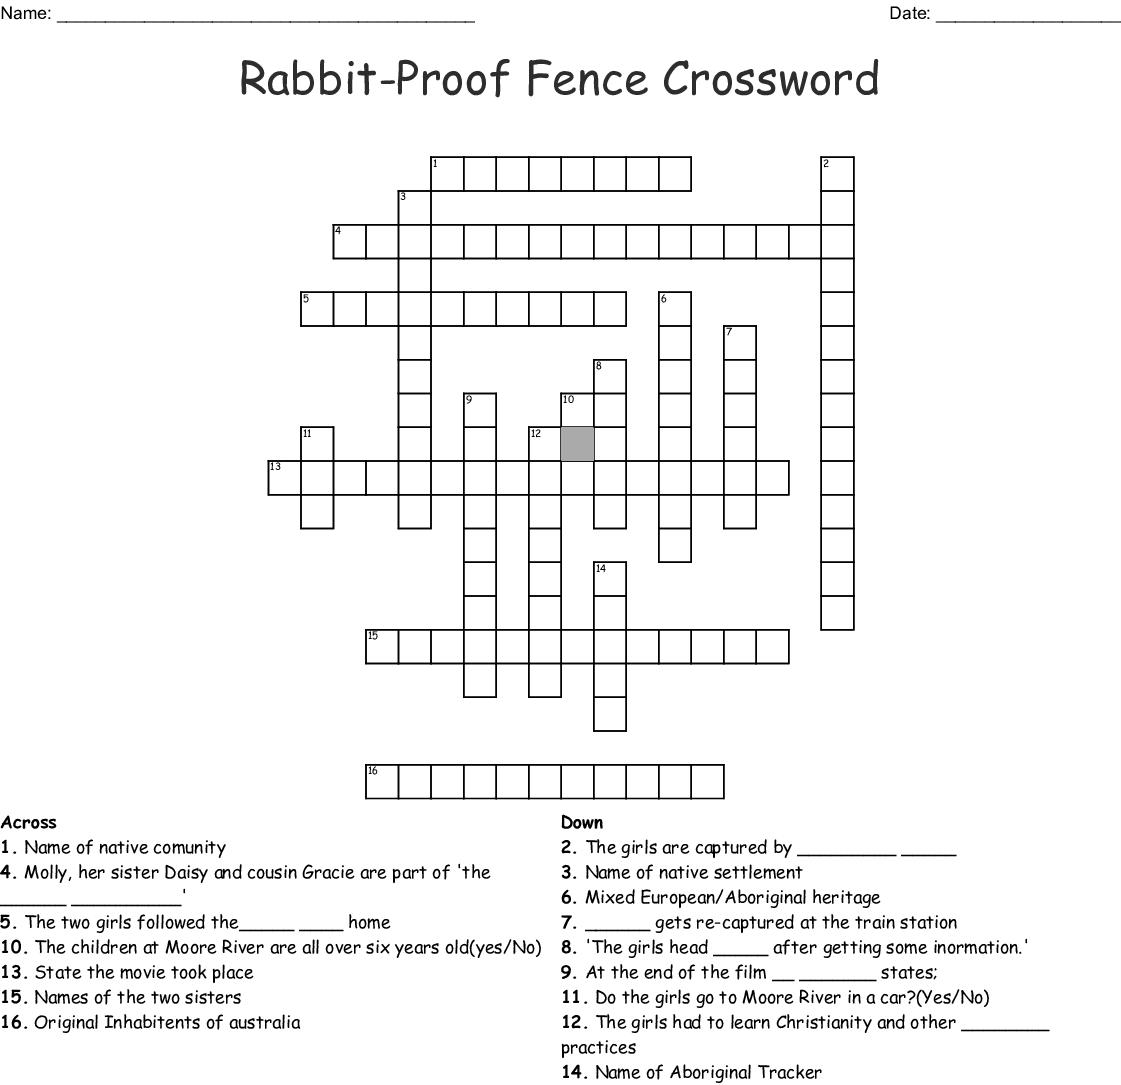 Rabbit Proof Fence Crossword